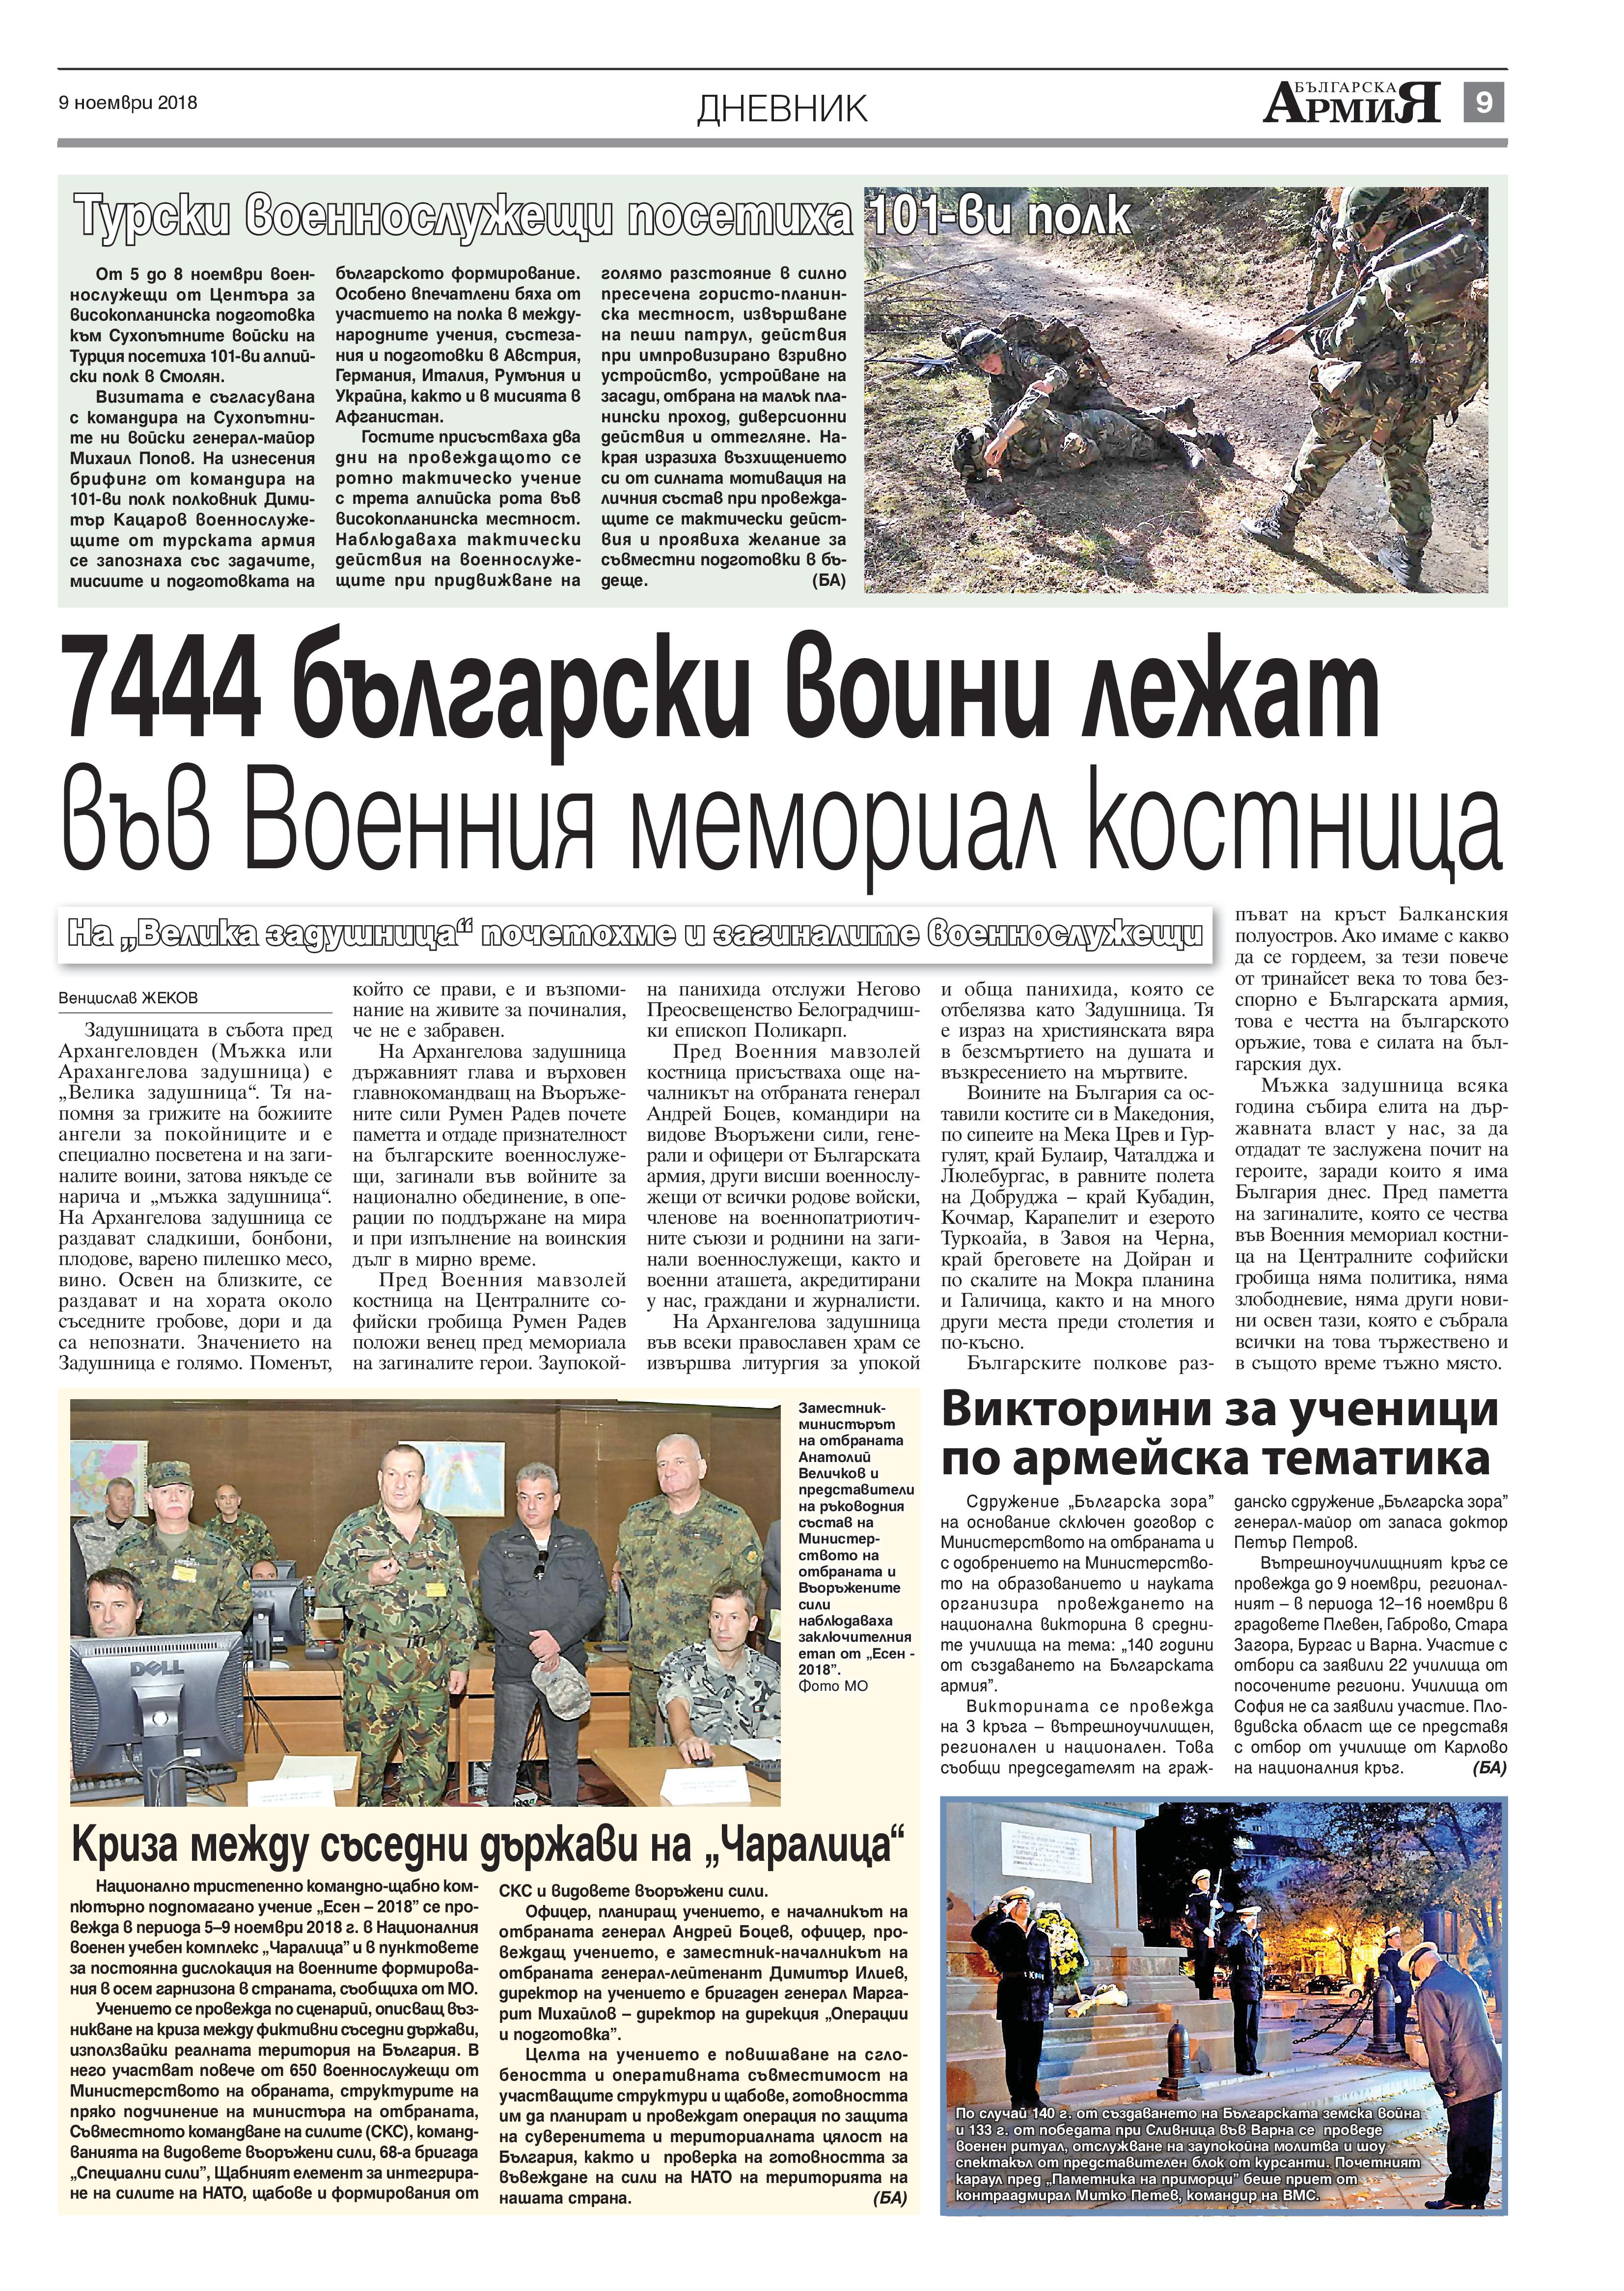 https://armymedia.bg/wp-content/uploads/2015/06/09-24.jpg